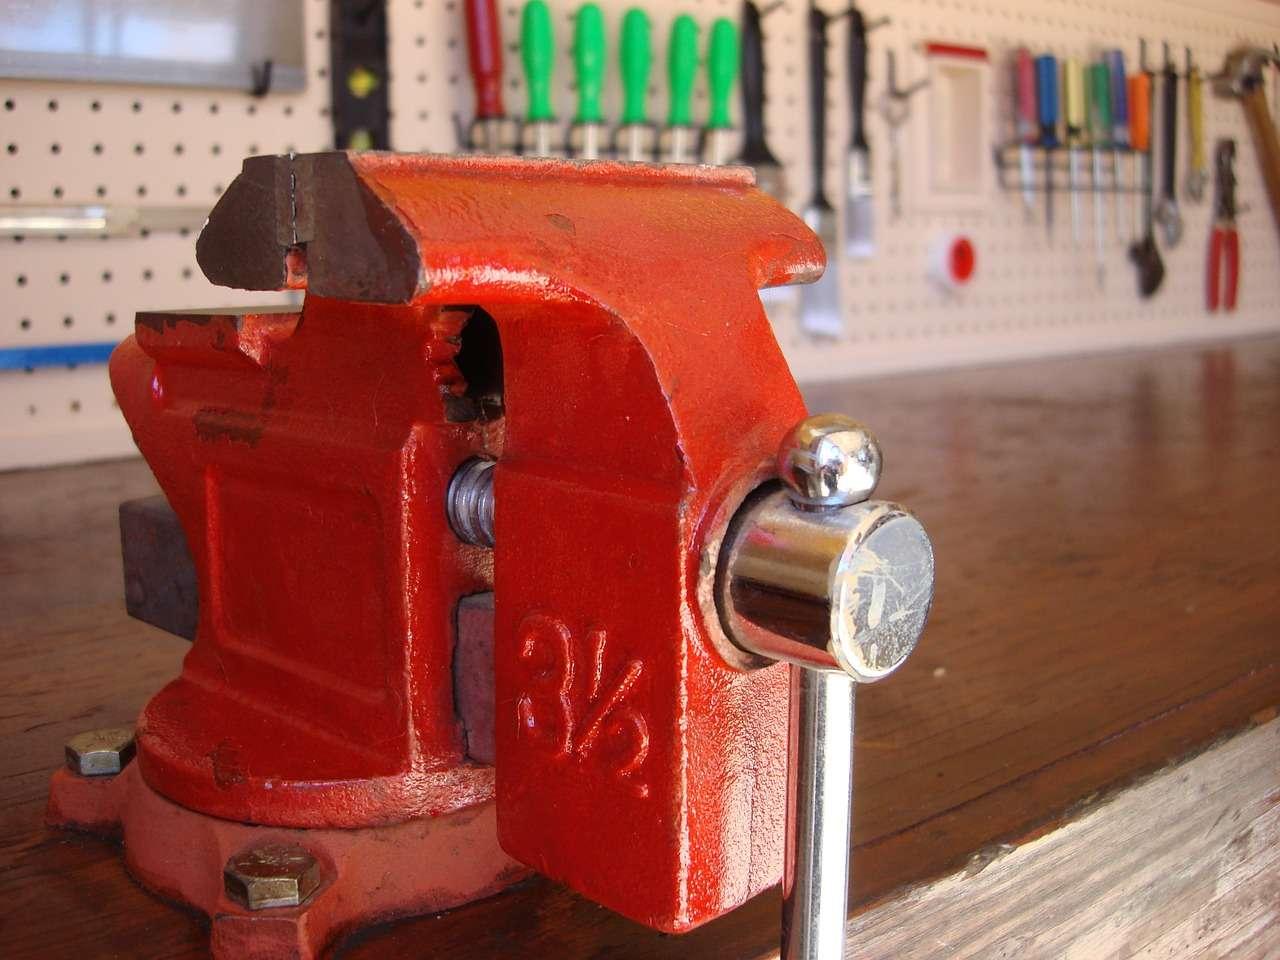 Garage Remodel Turn Your Garage into a DIY Heaven - 1